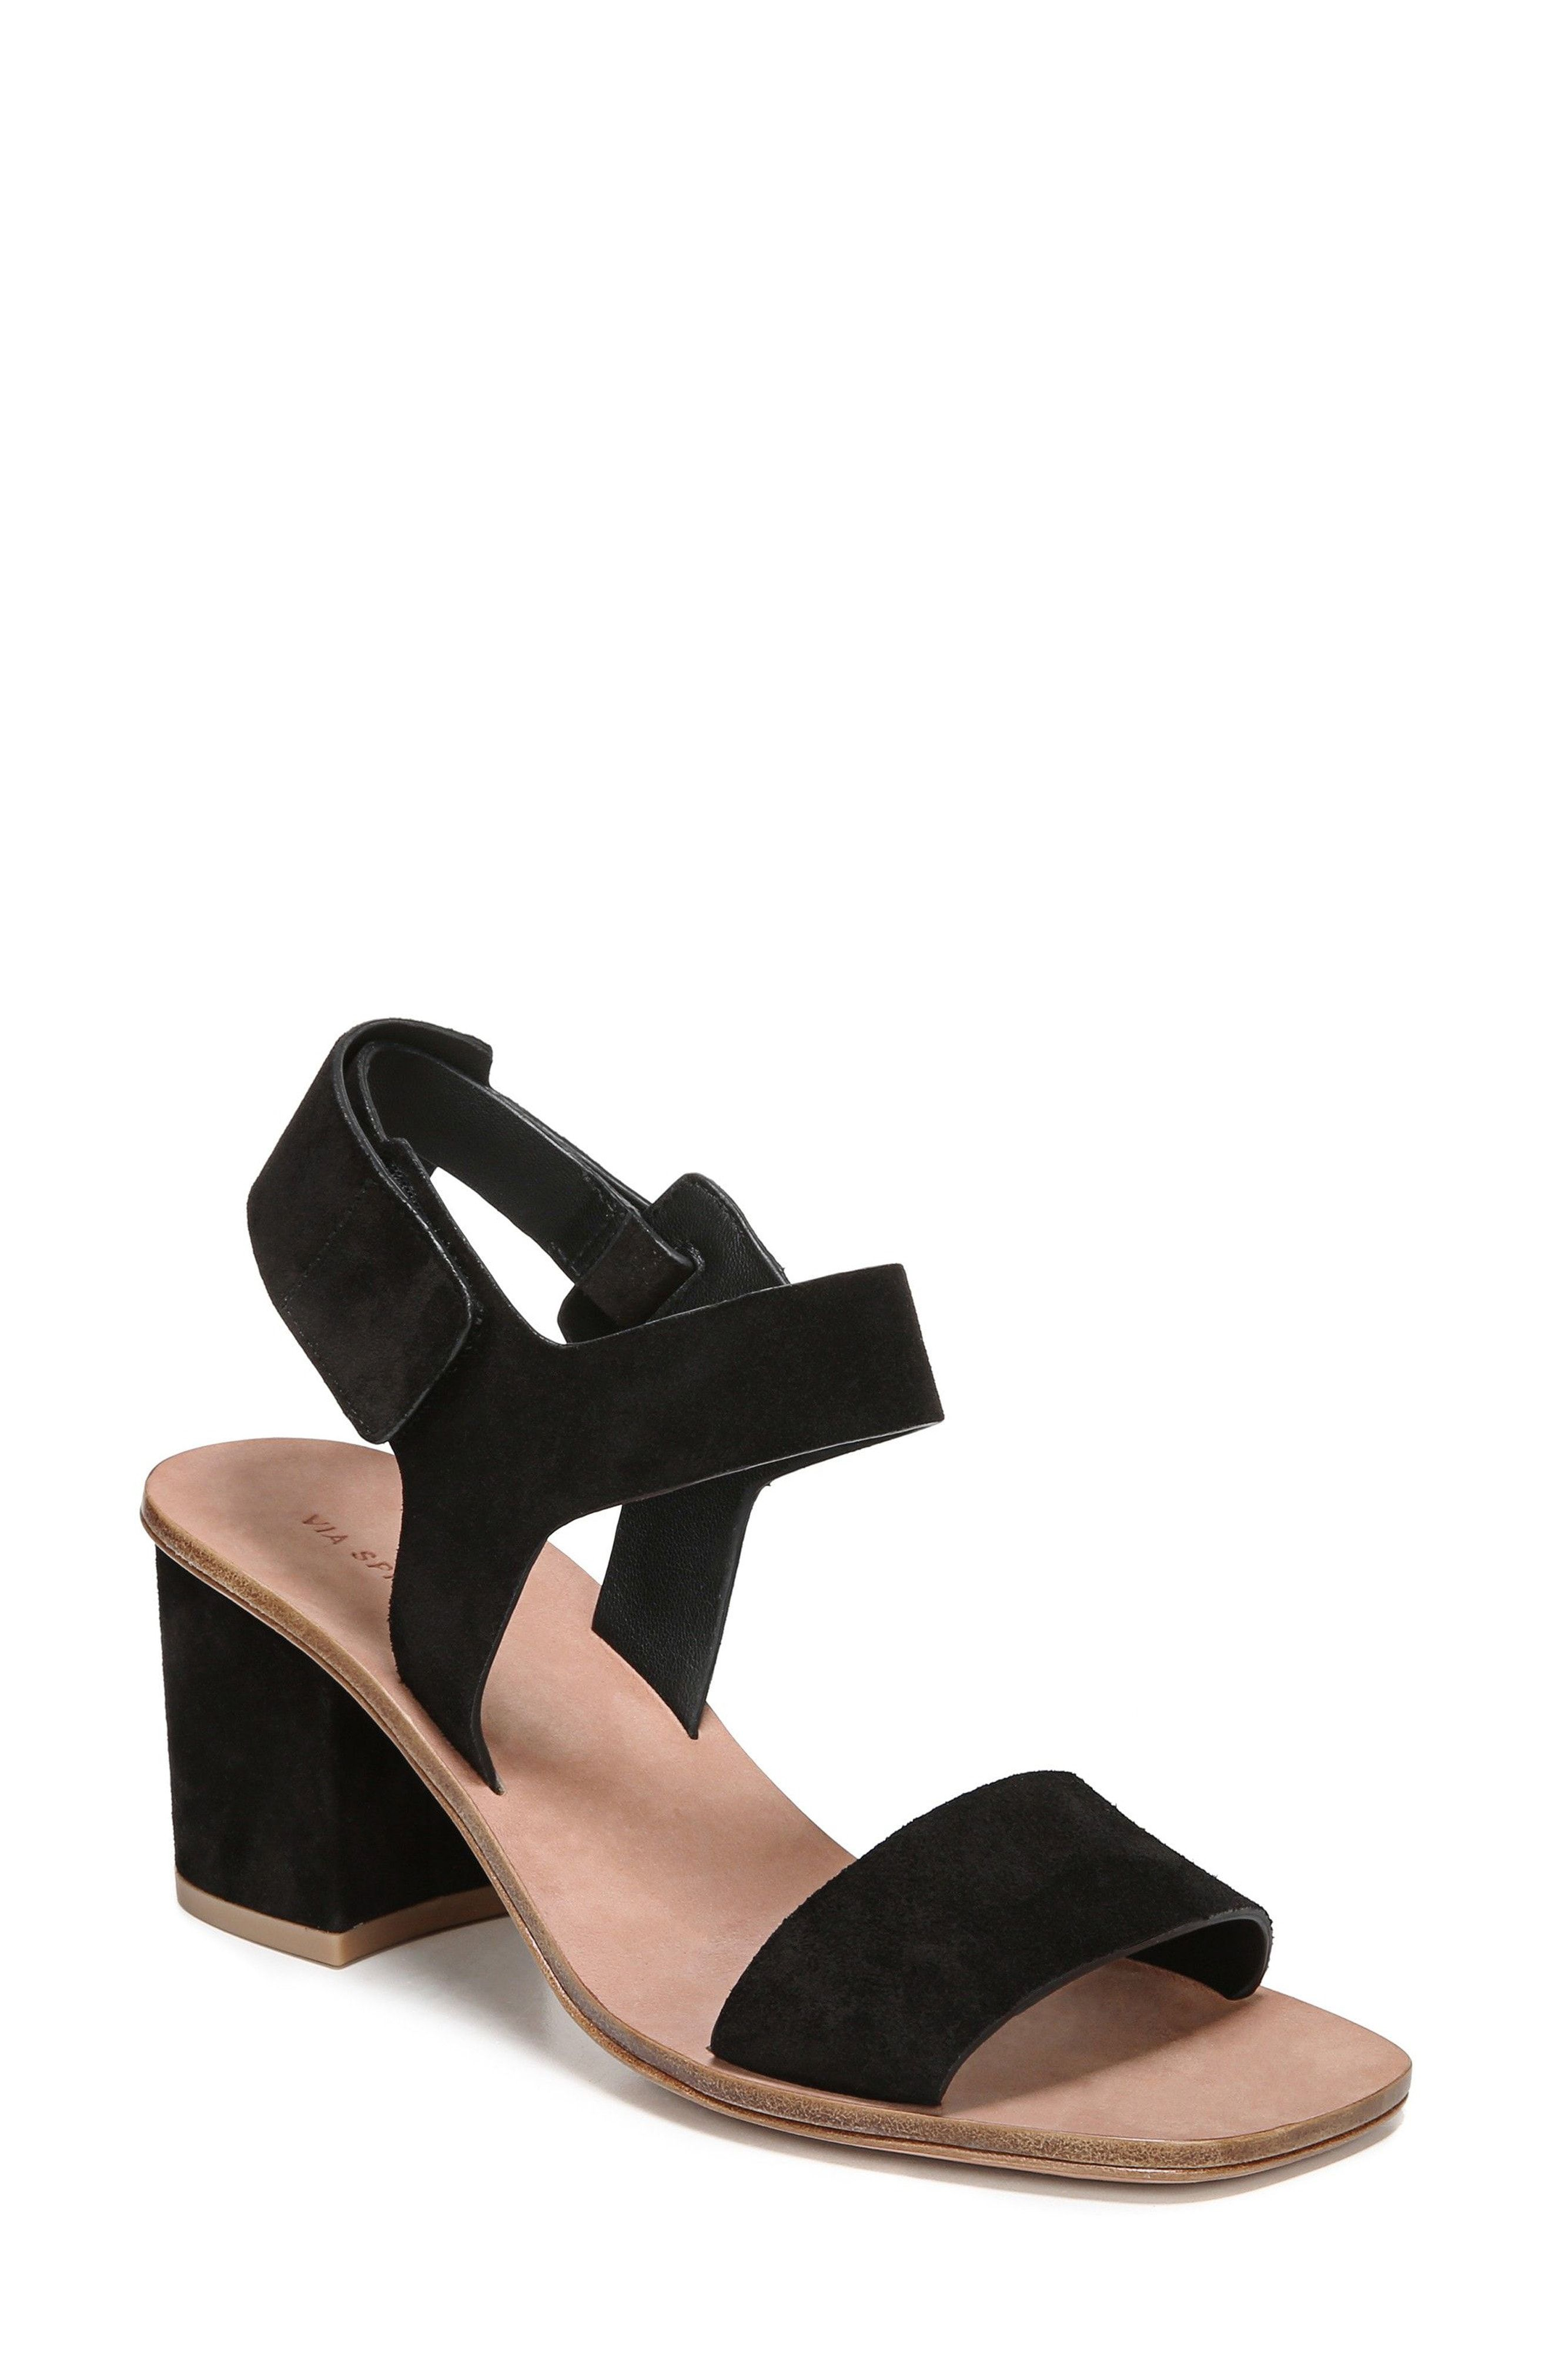 6d596520922 Via Spiga Women S Kamille Suede Block Heel Ankle Strap Sandals ...